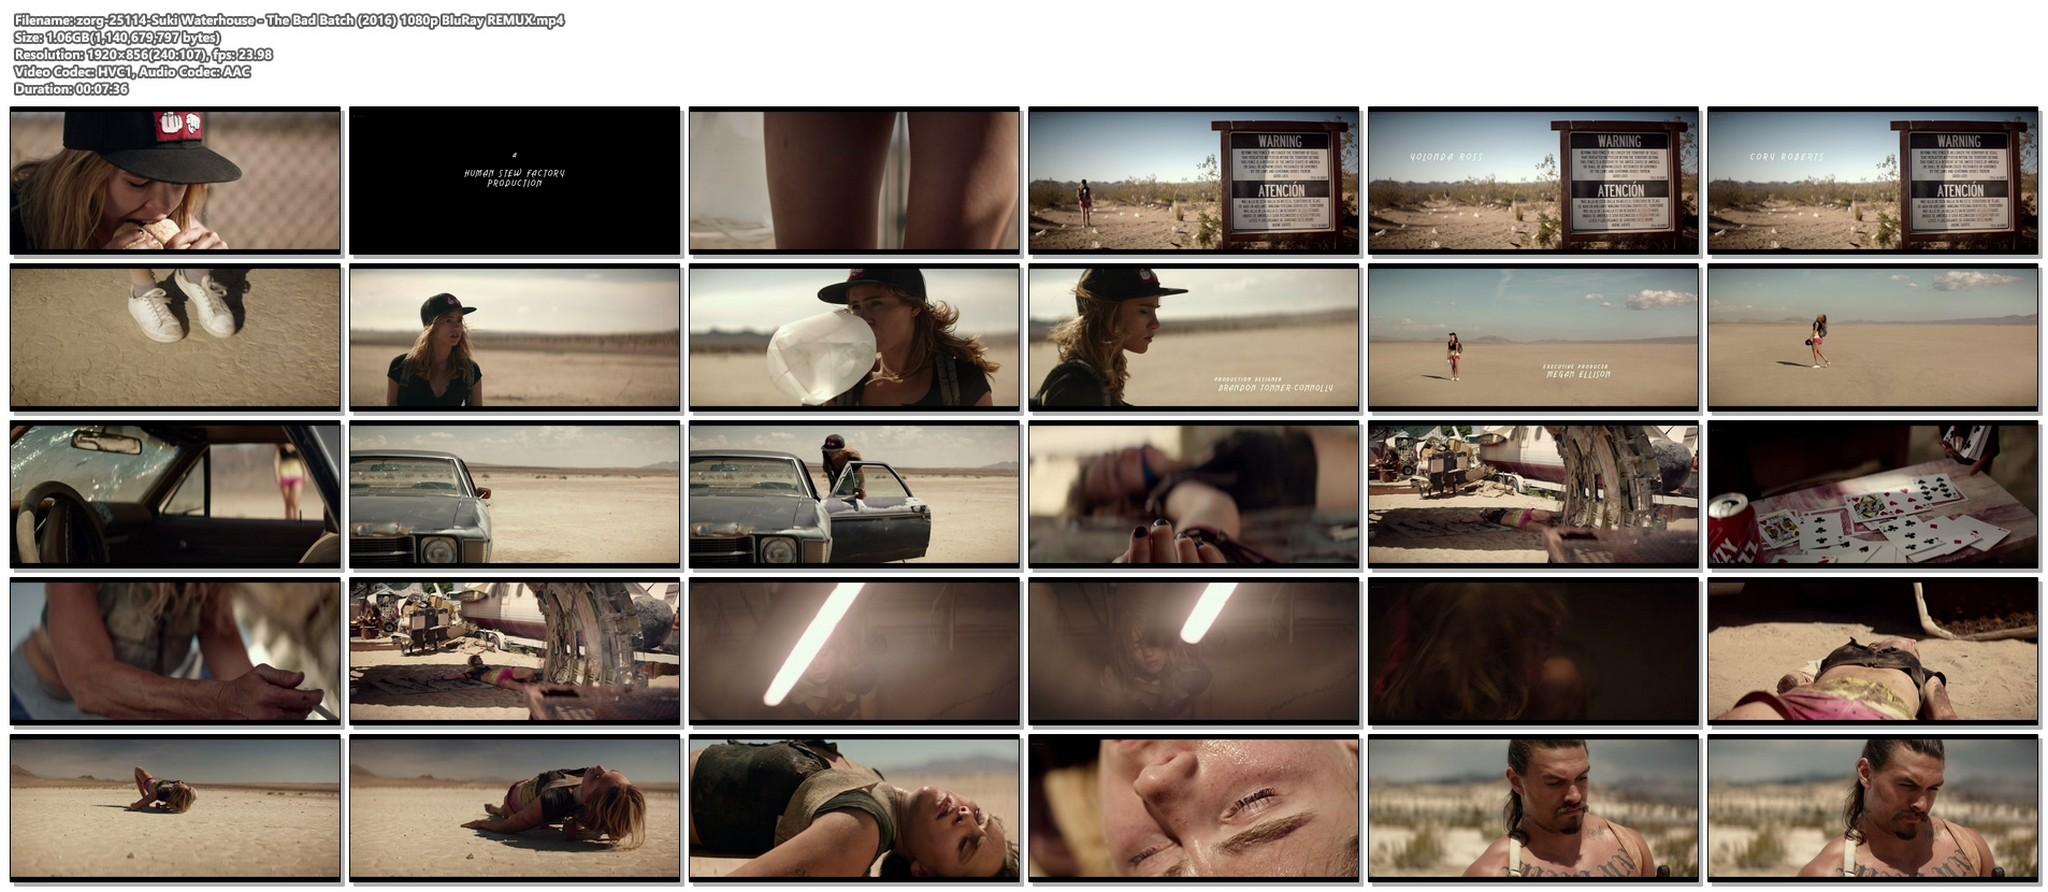 Suki Waterhouse sexy The Bad Batch 2016 1080p BluRay REMUX 18